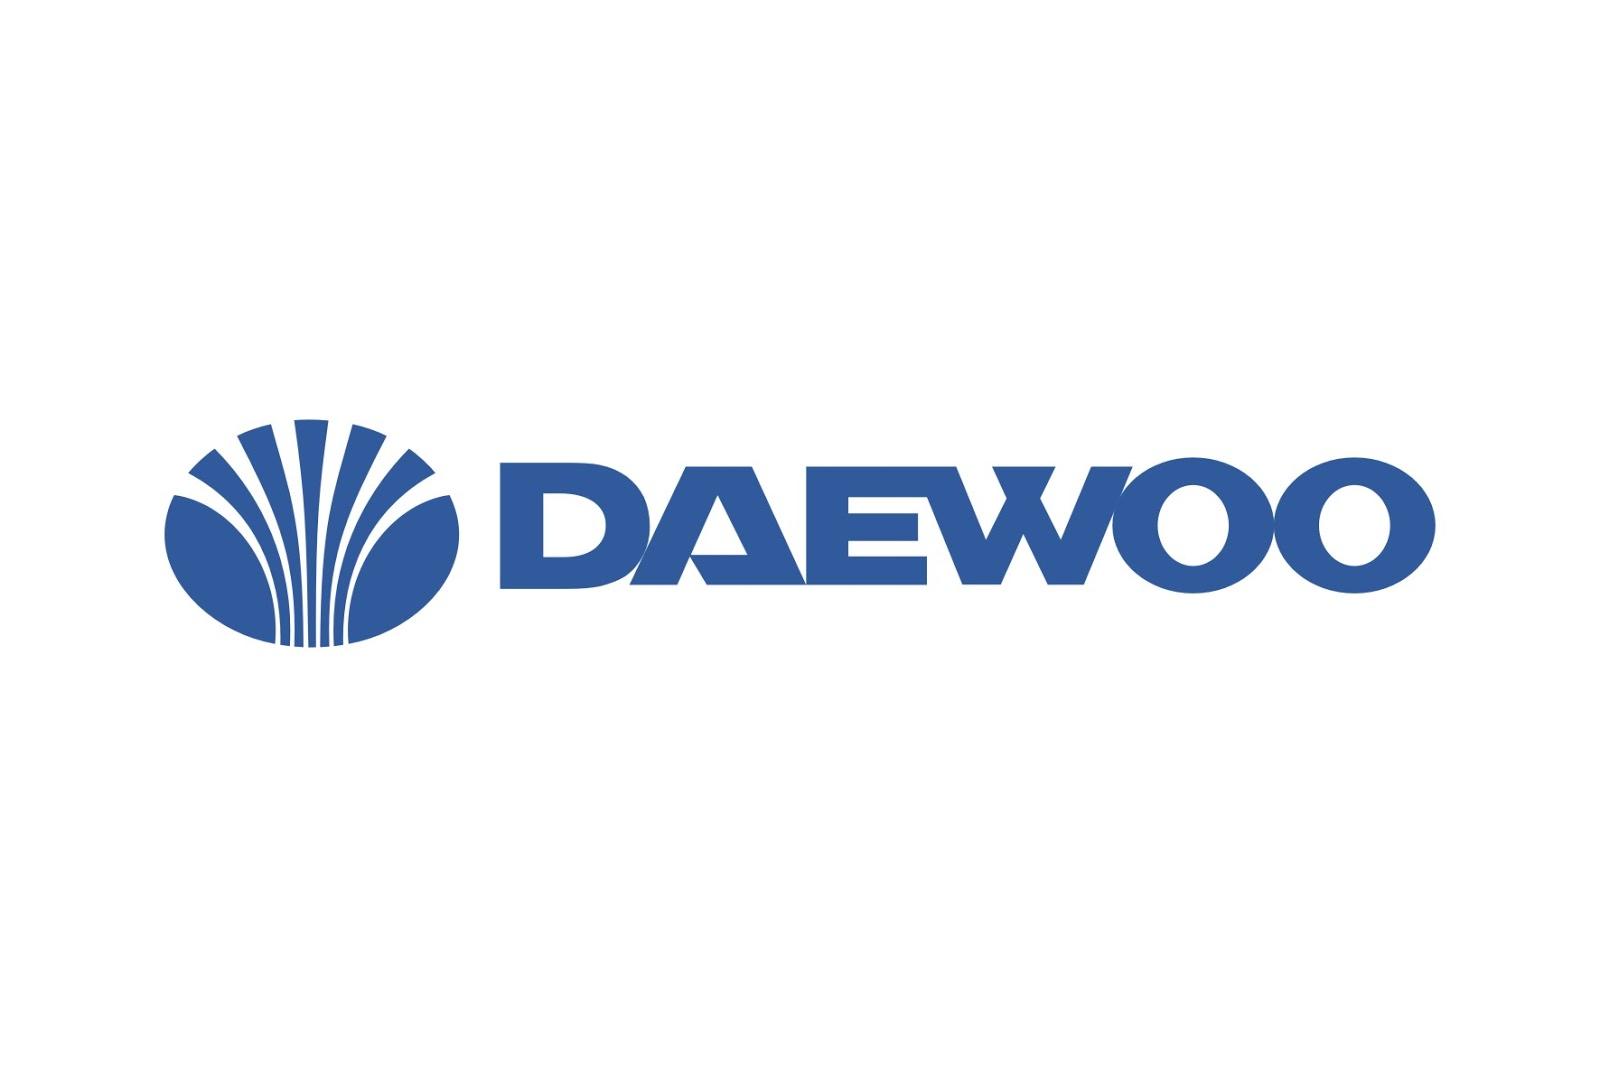 Daewoo symbol wallpapers HD